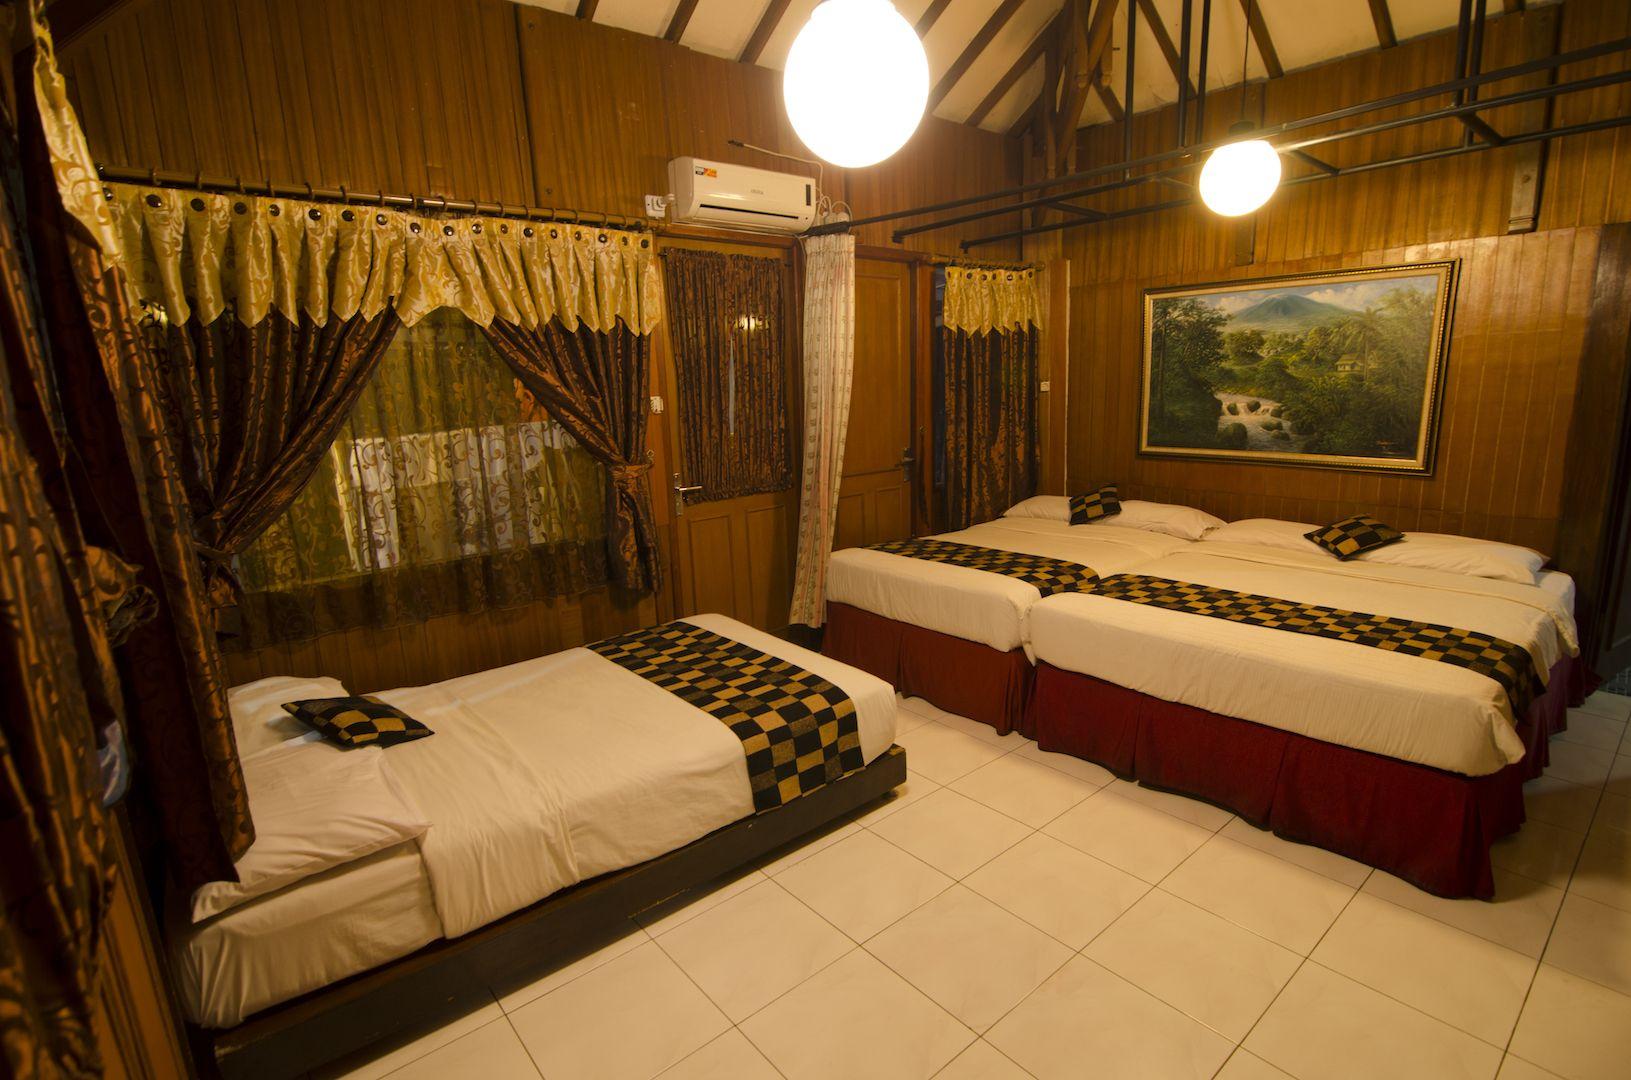 Fora Guest House Taman Lingkar Selatan, Bandung